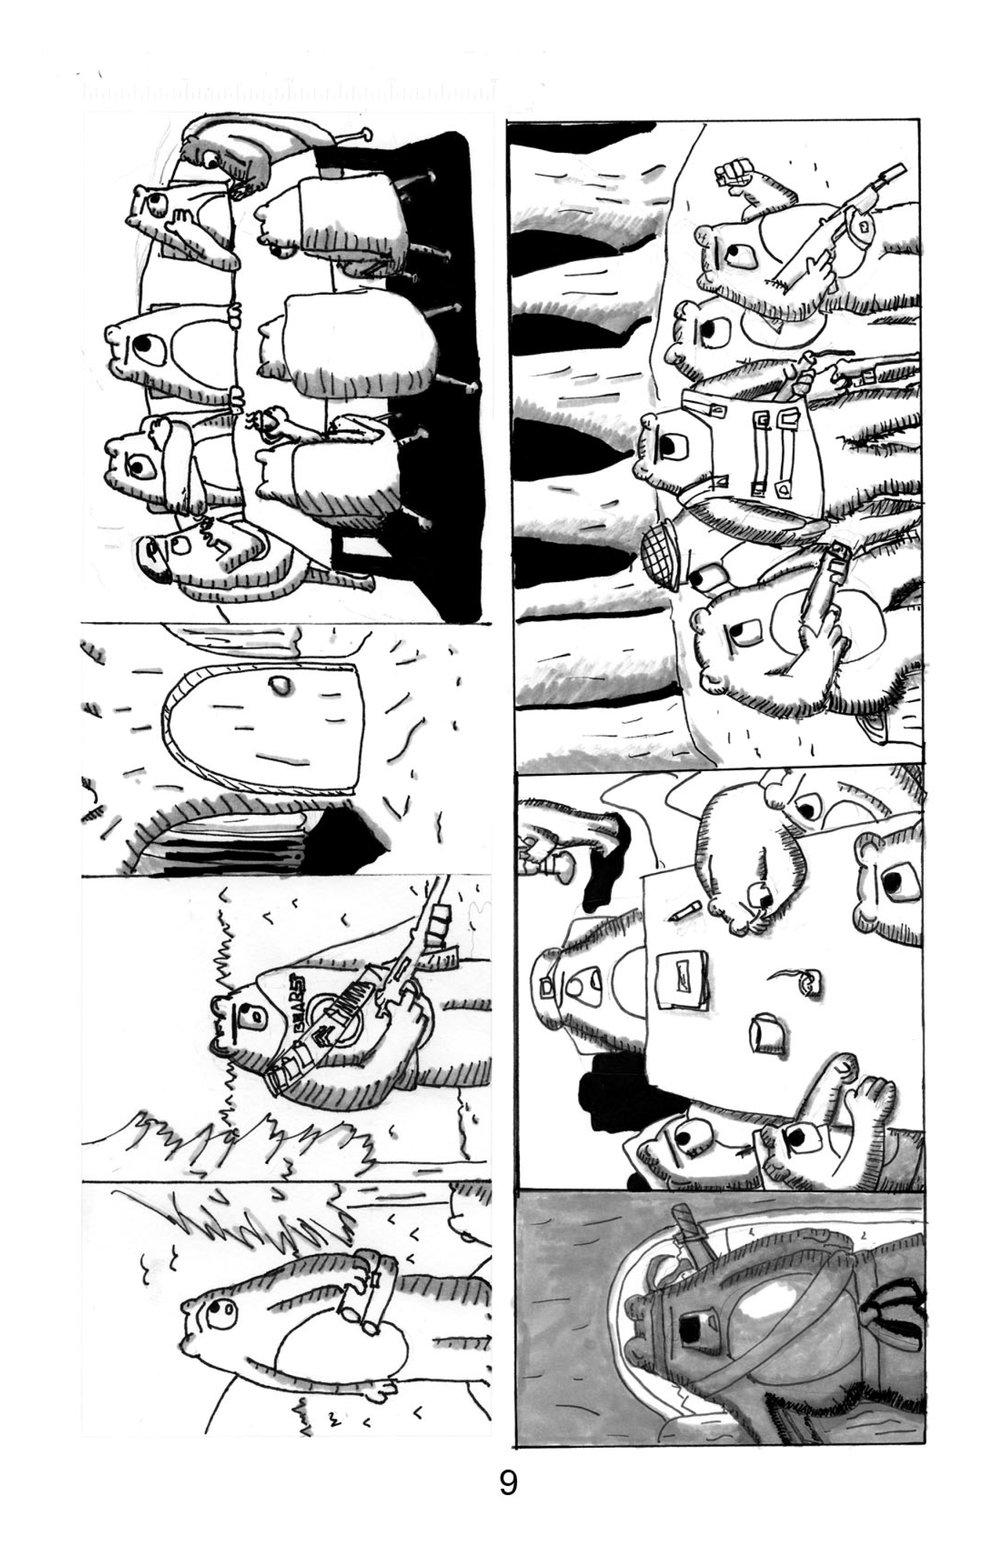 ev page 9.jpg